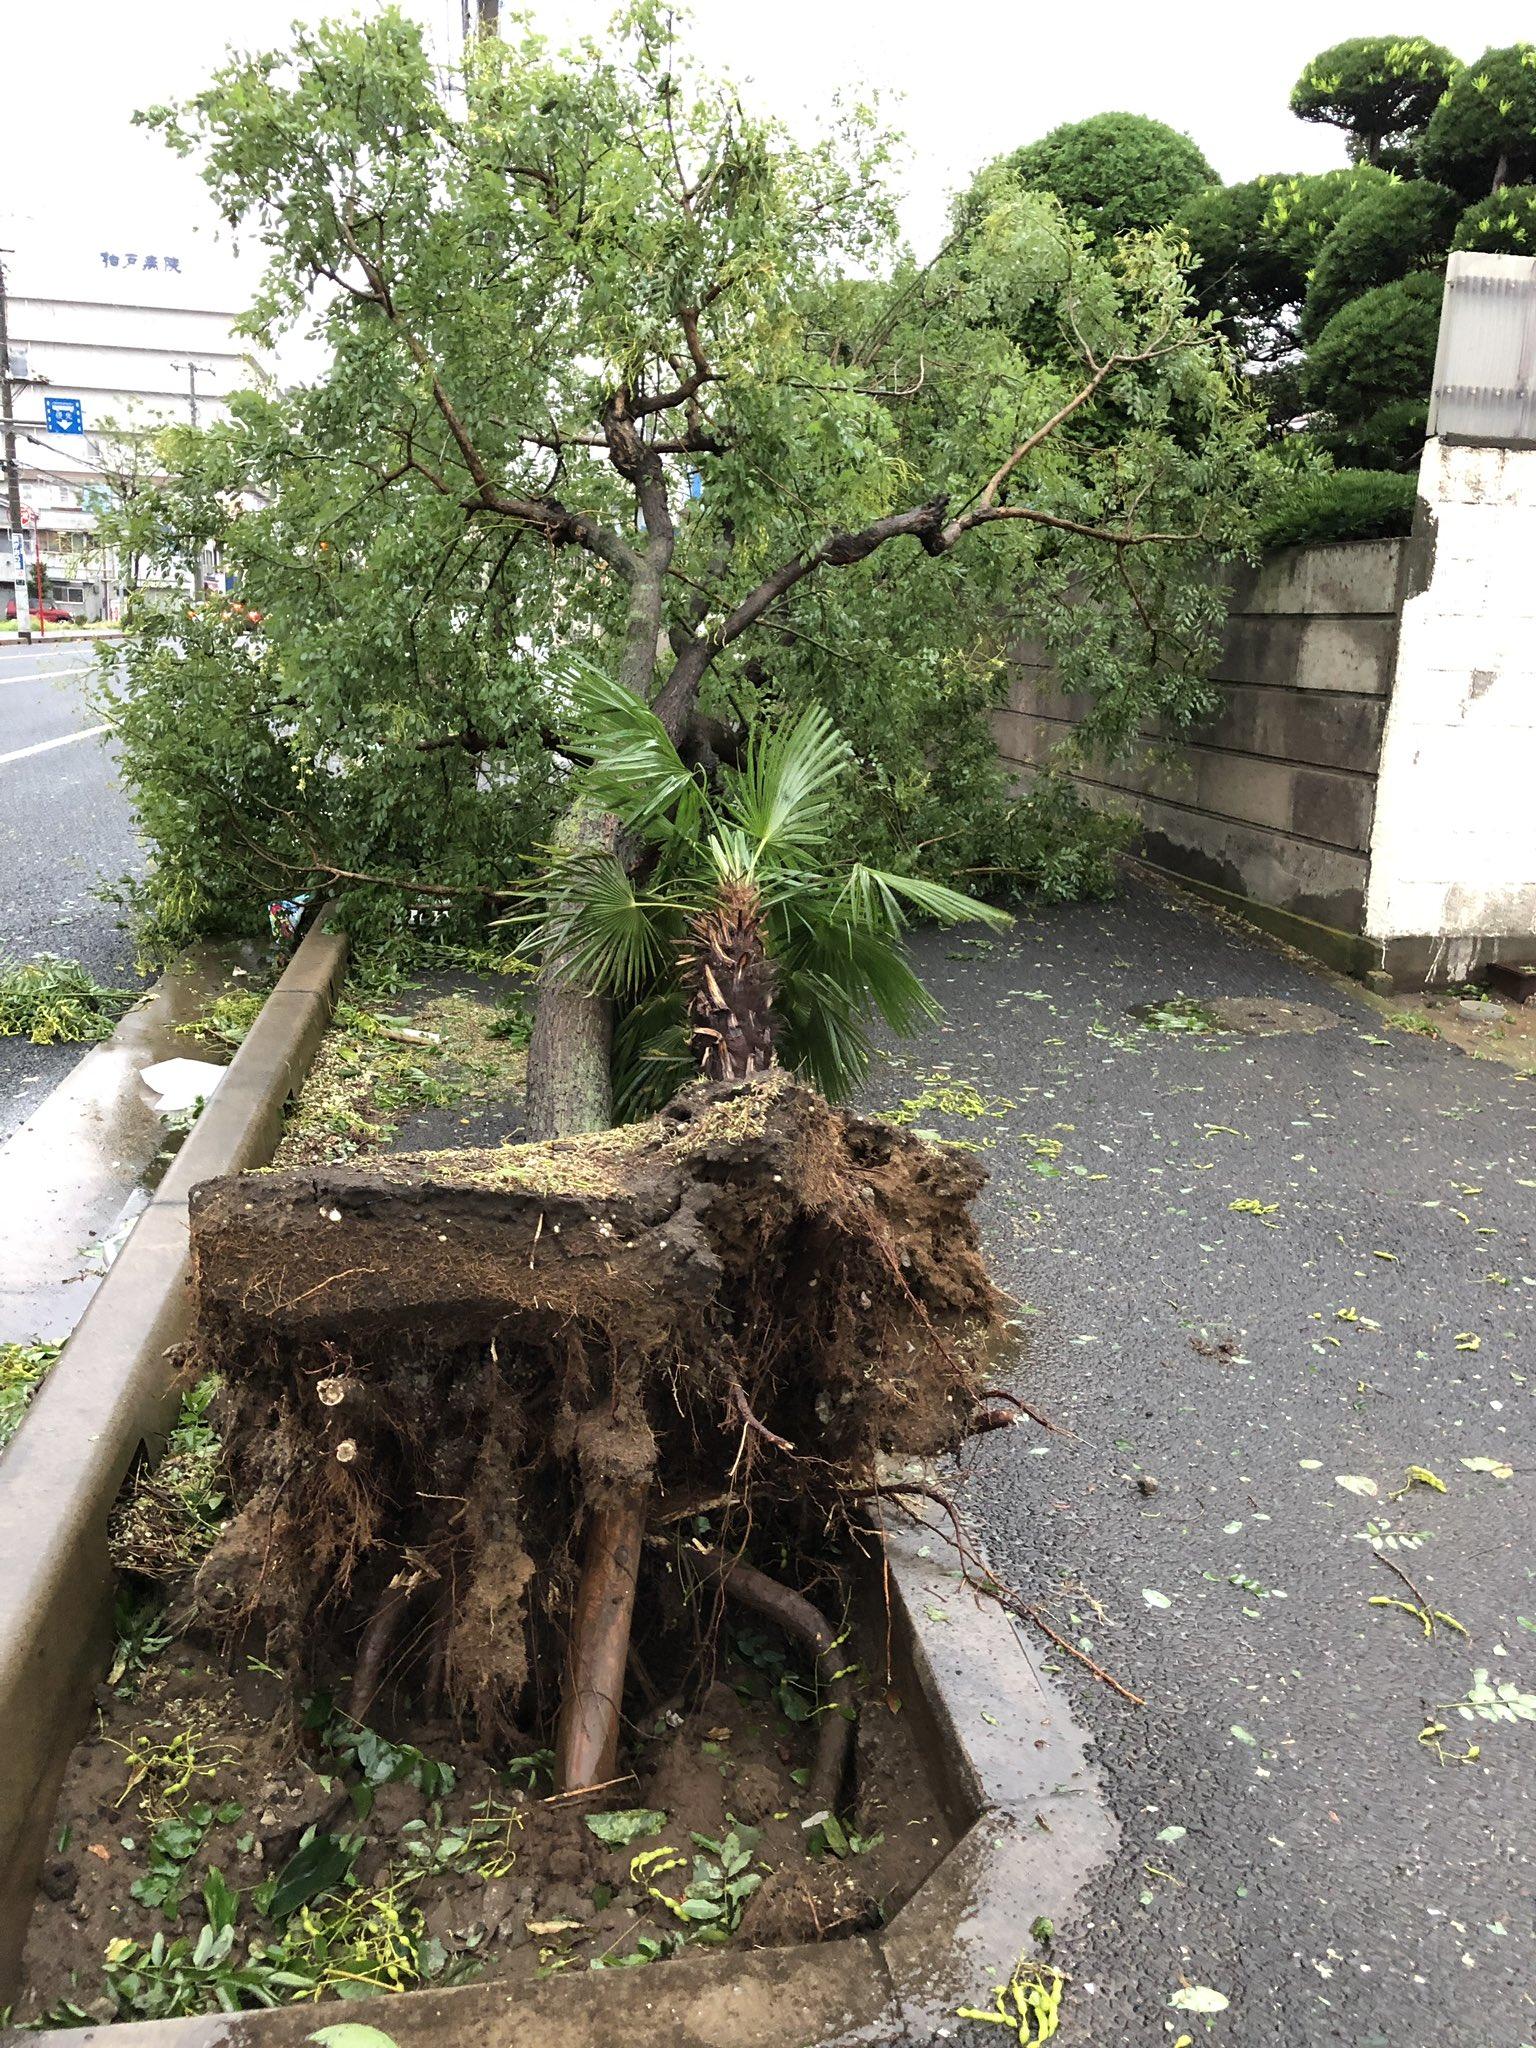 画像,倒木発見#千葉市 https://t.co/hBwV8luedt。